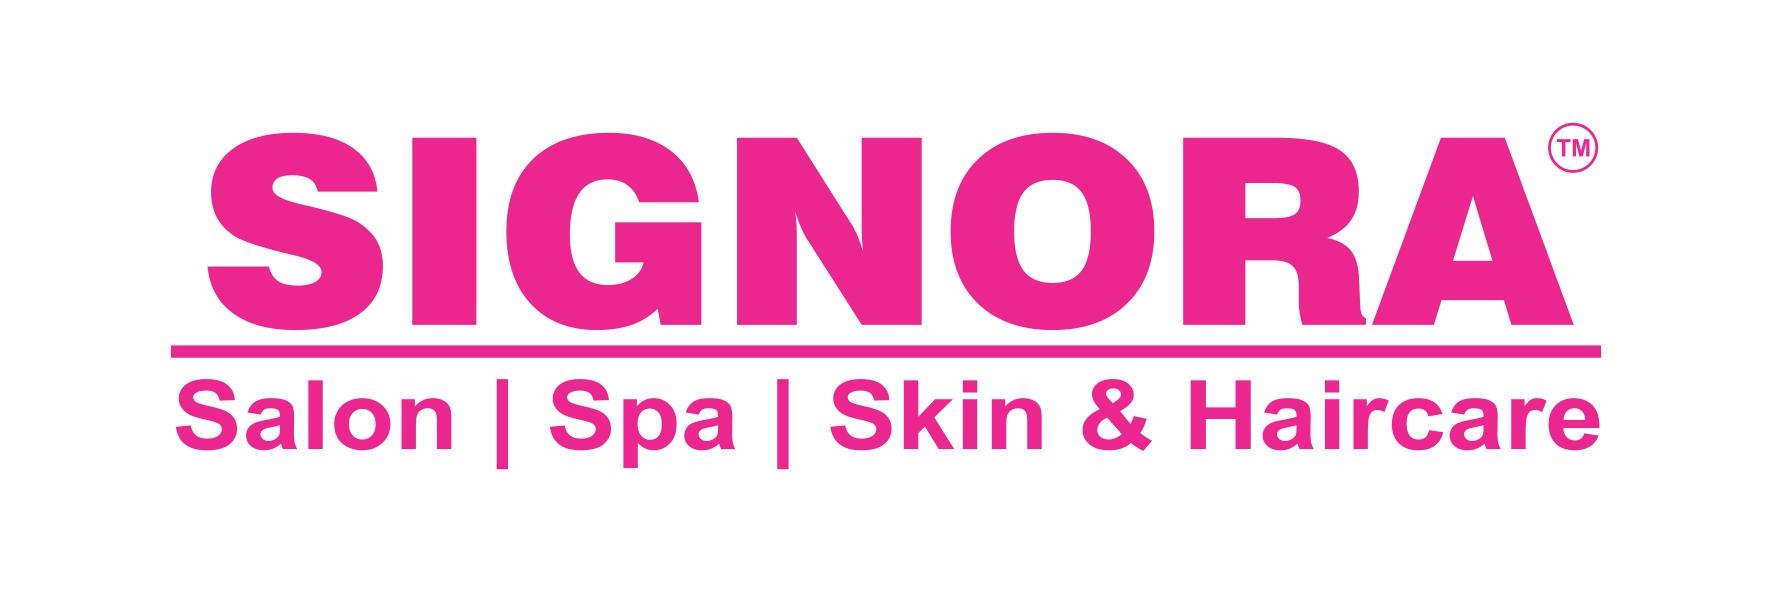 Signora Spa And Salon - Marathahalli - Bangalore Image